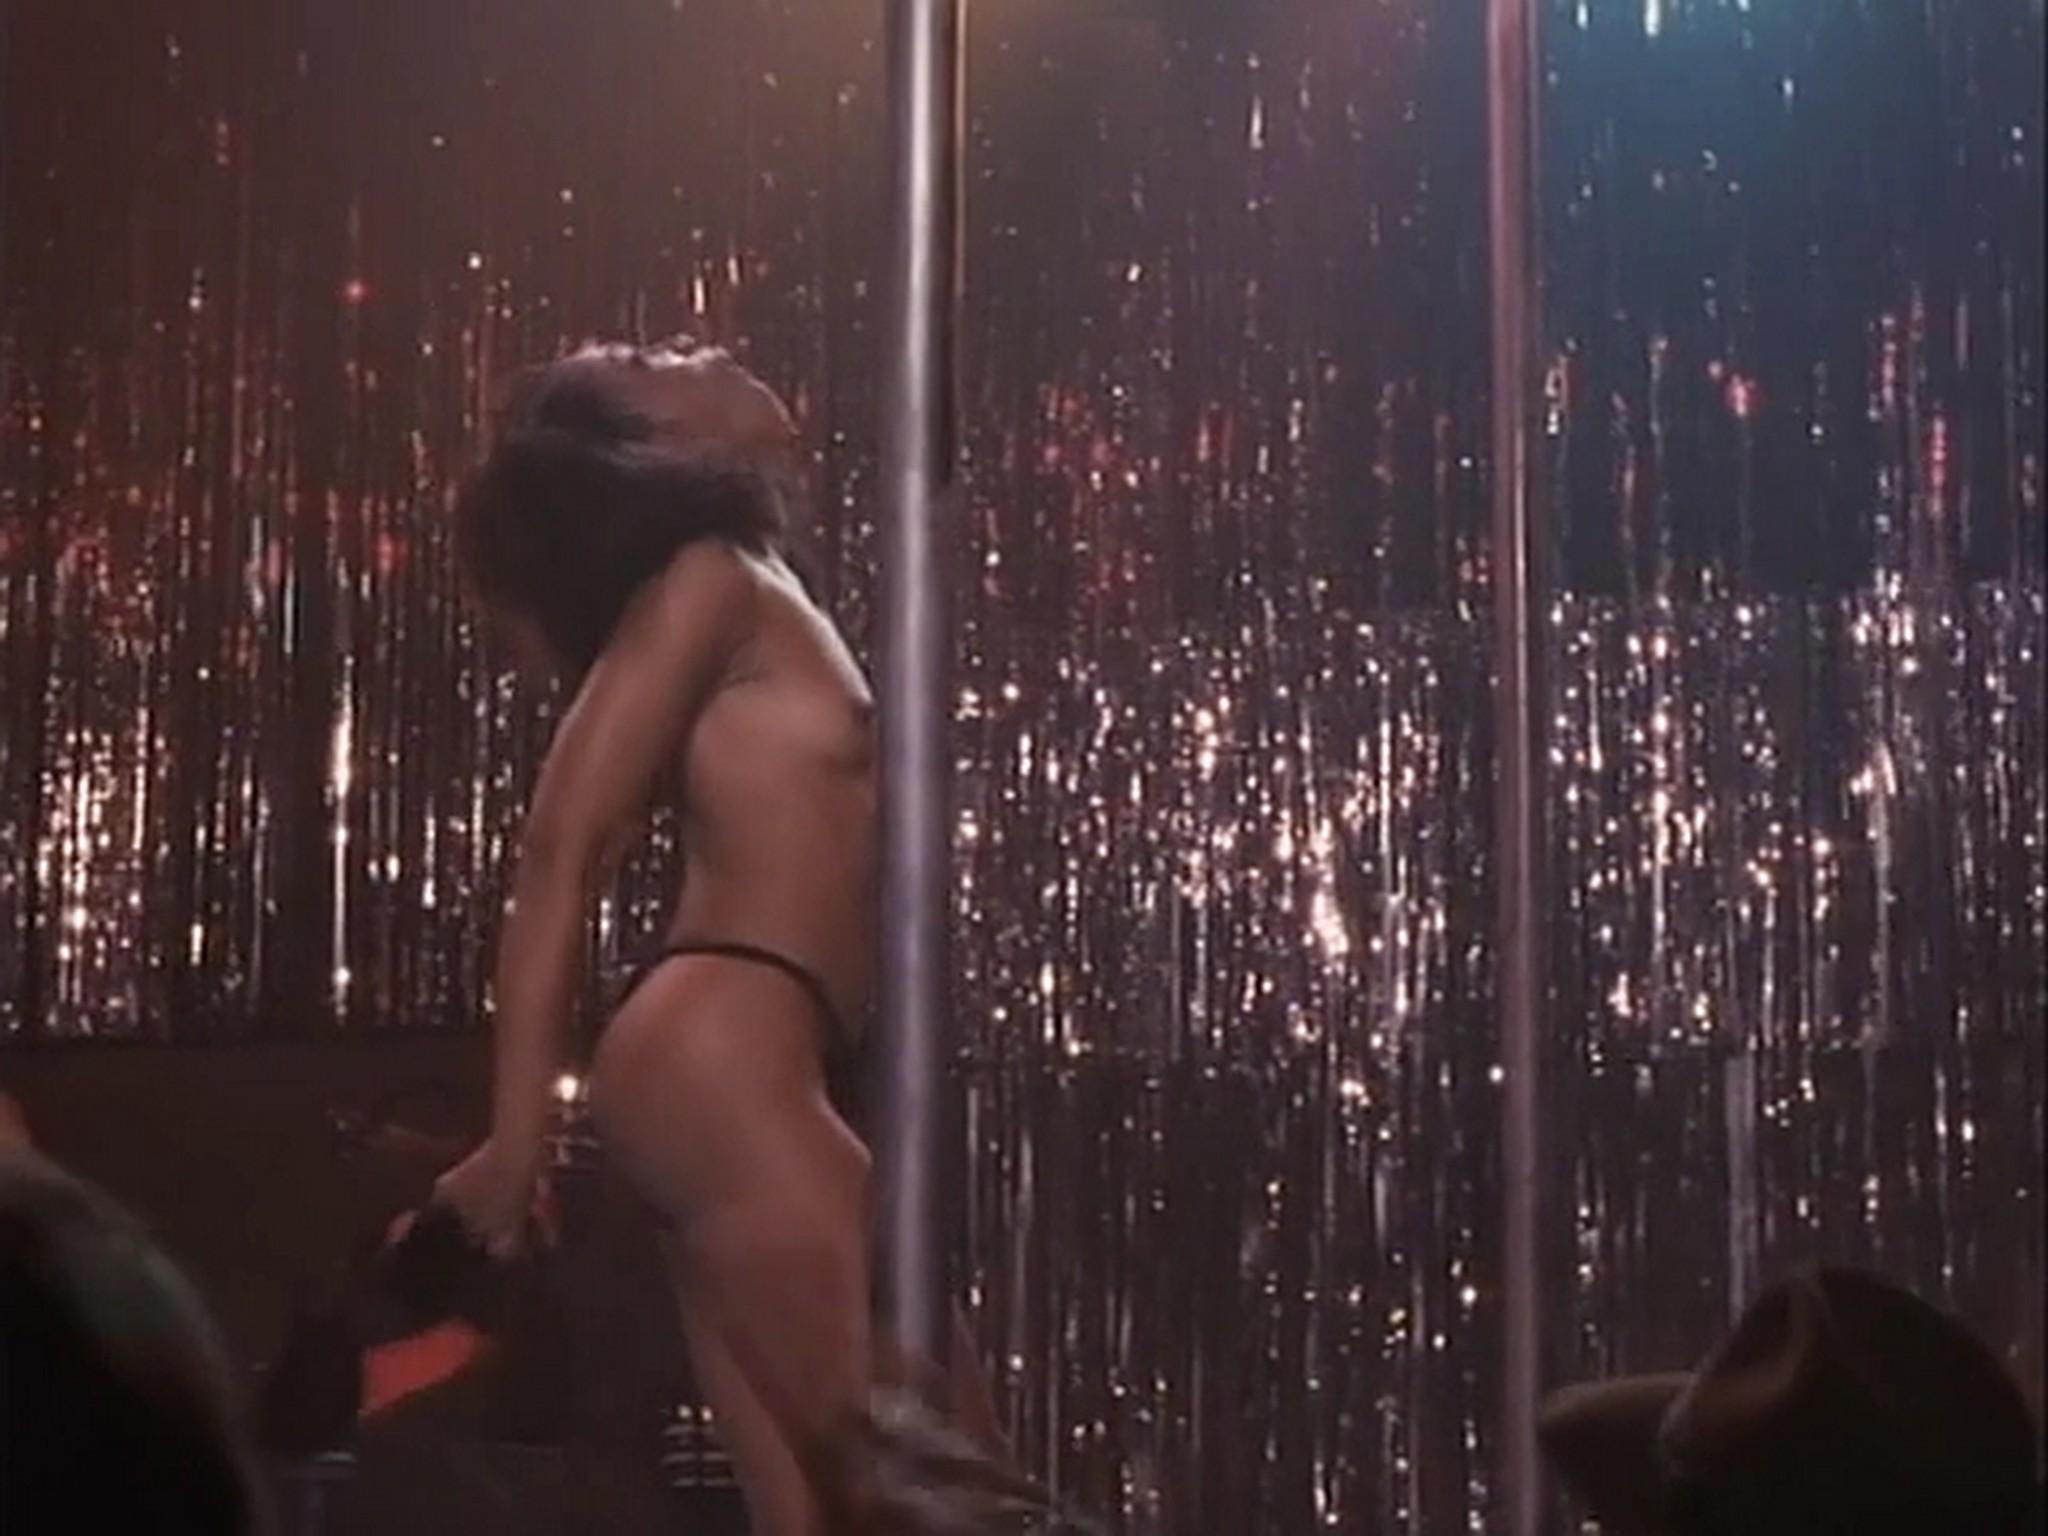 Barbara Alyn Woods nude Catya Sassoon Jill Pierce nude too as strippers Dance with Death 1991 10